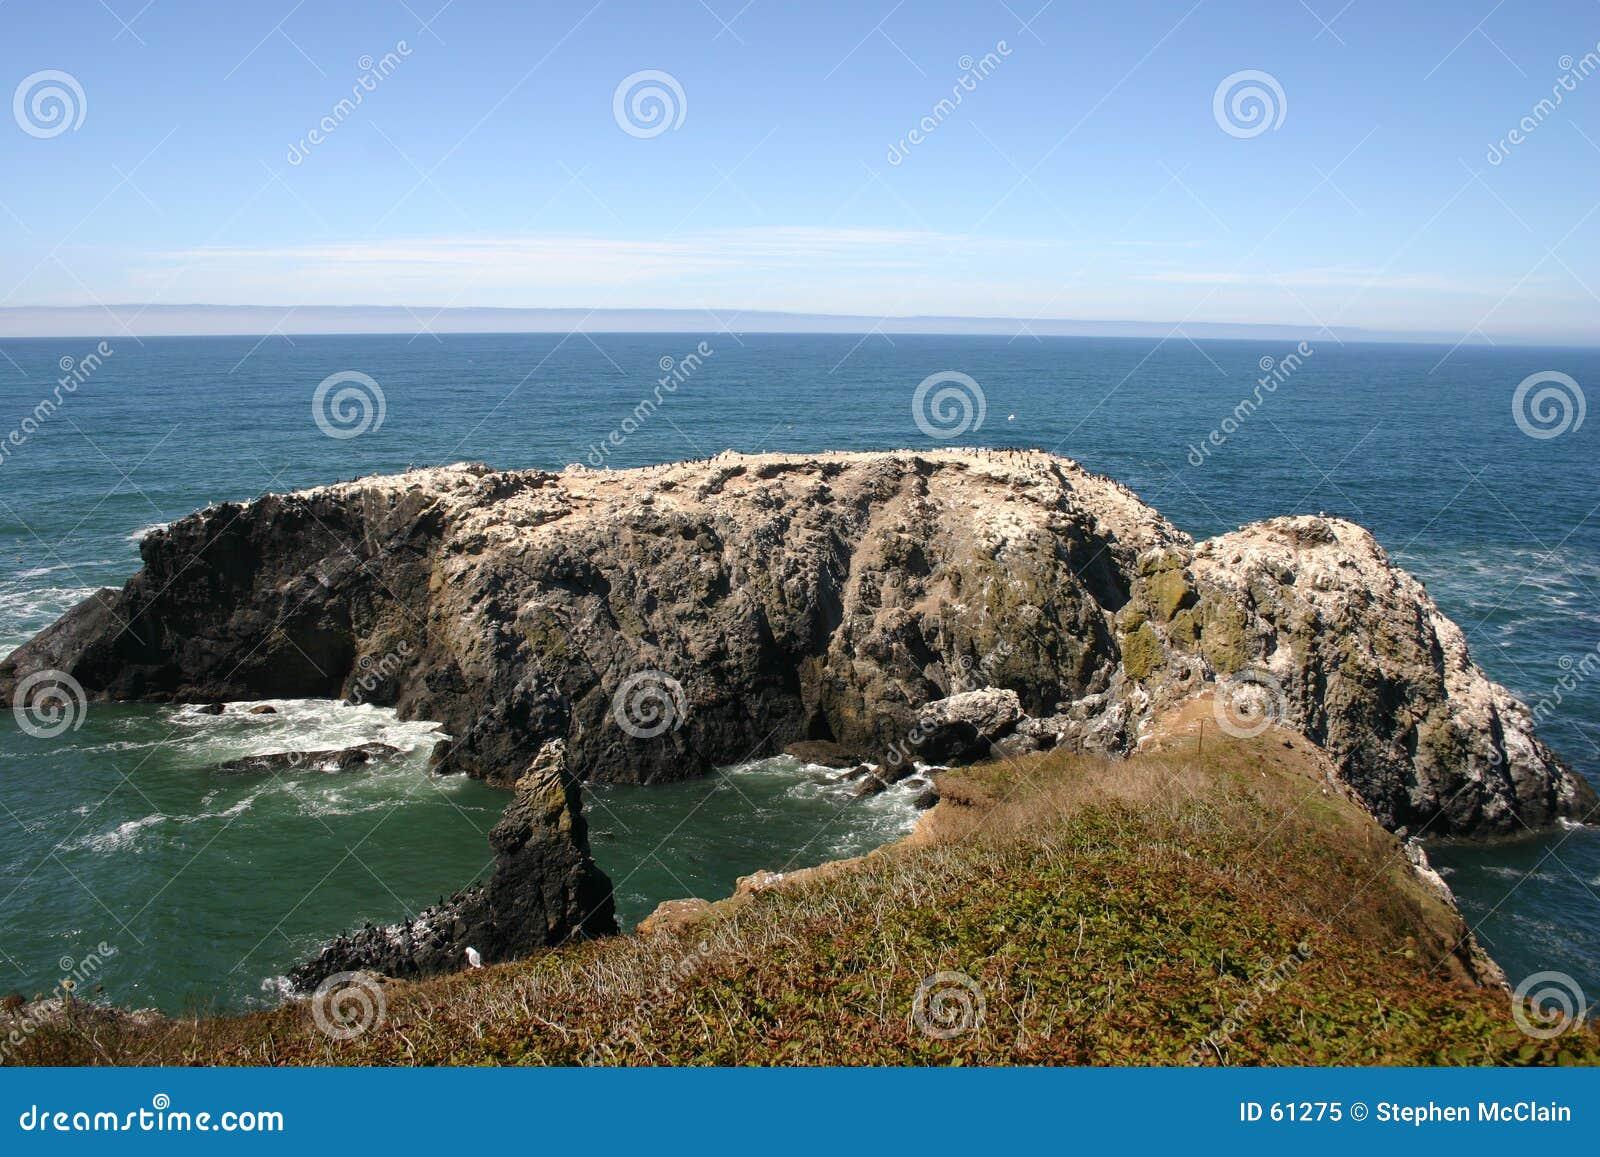 Petite péninsule de roche